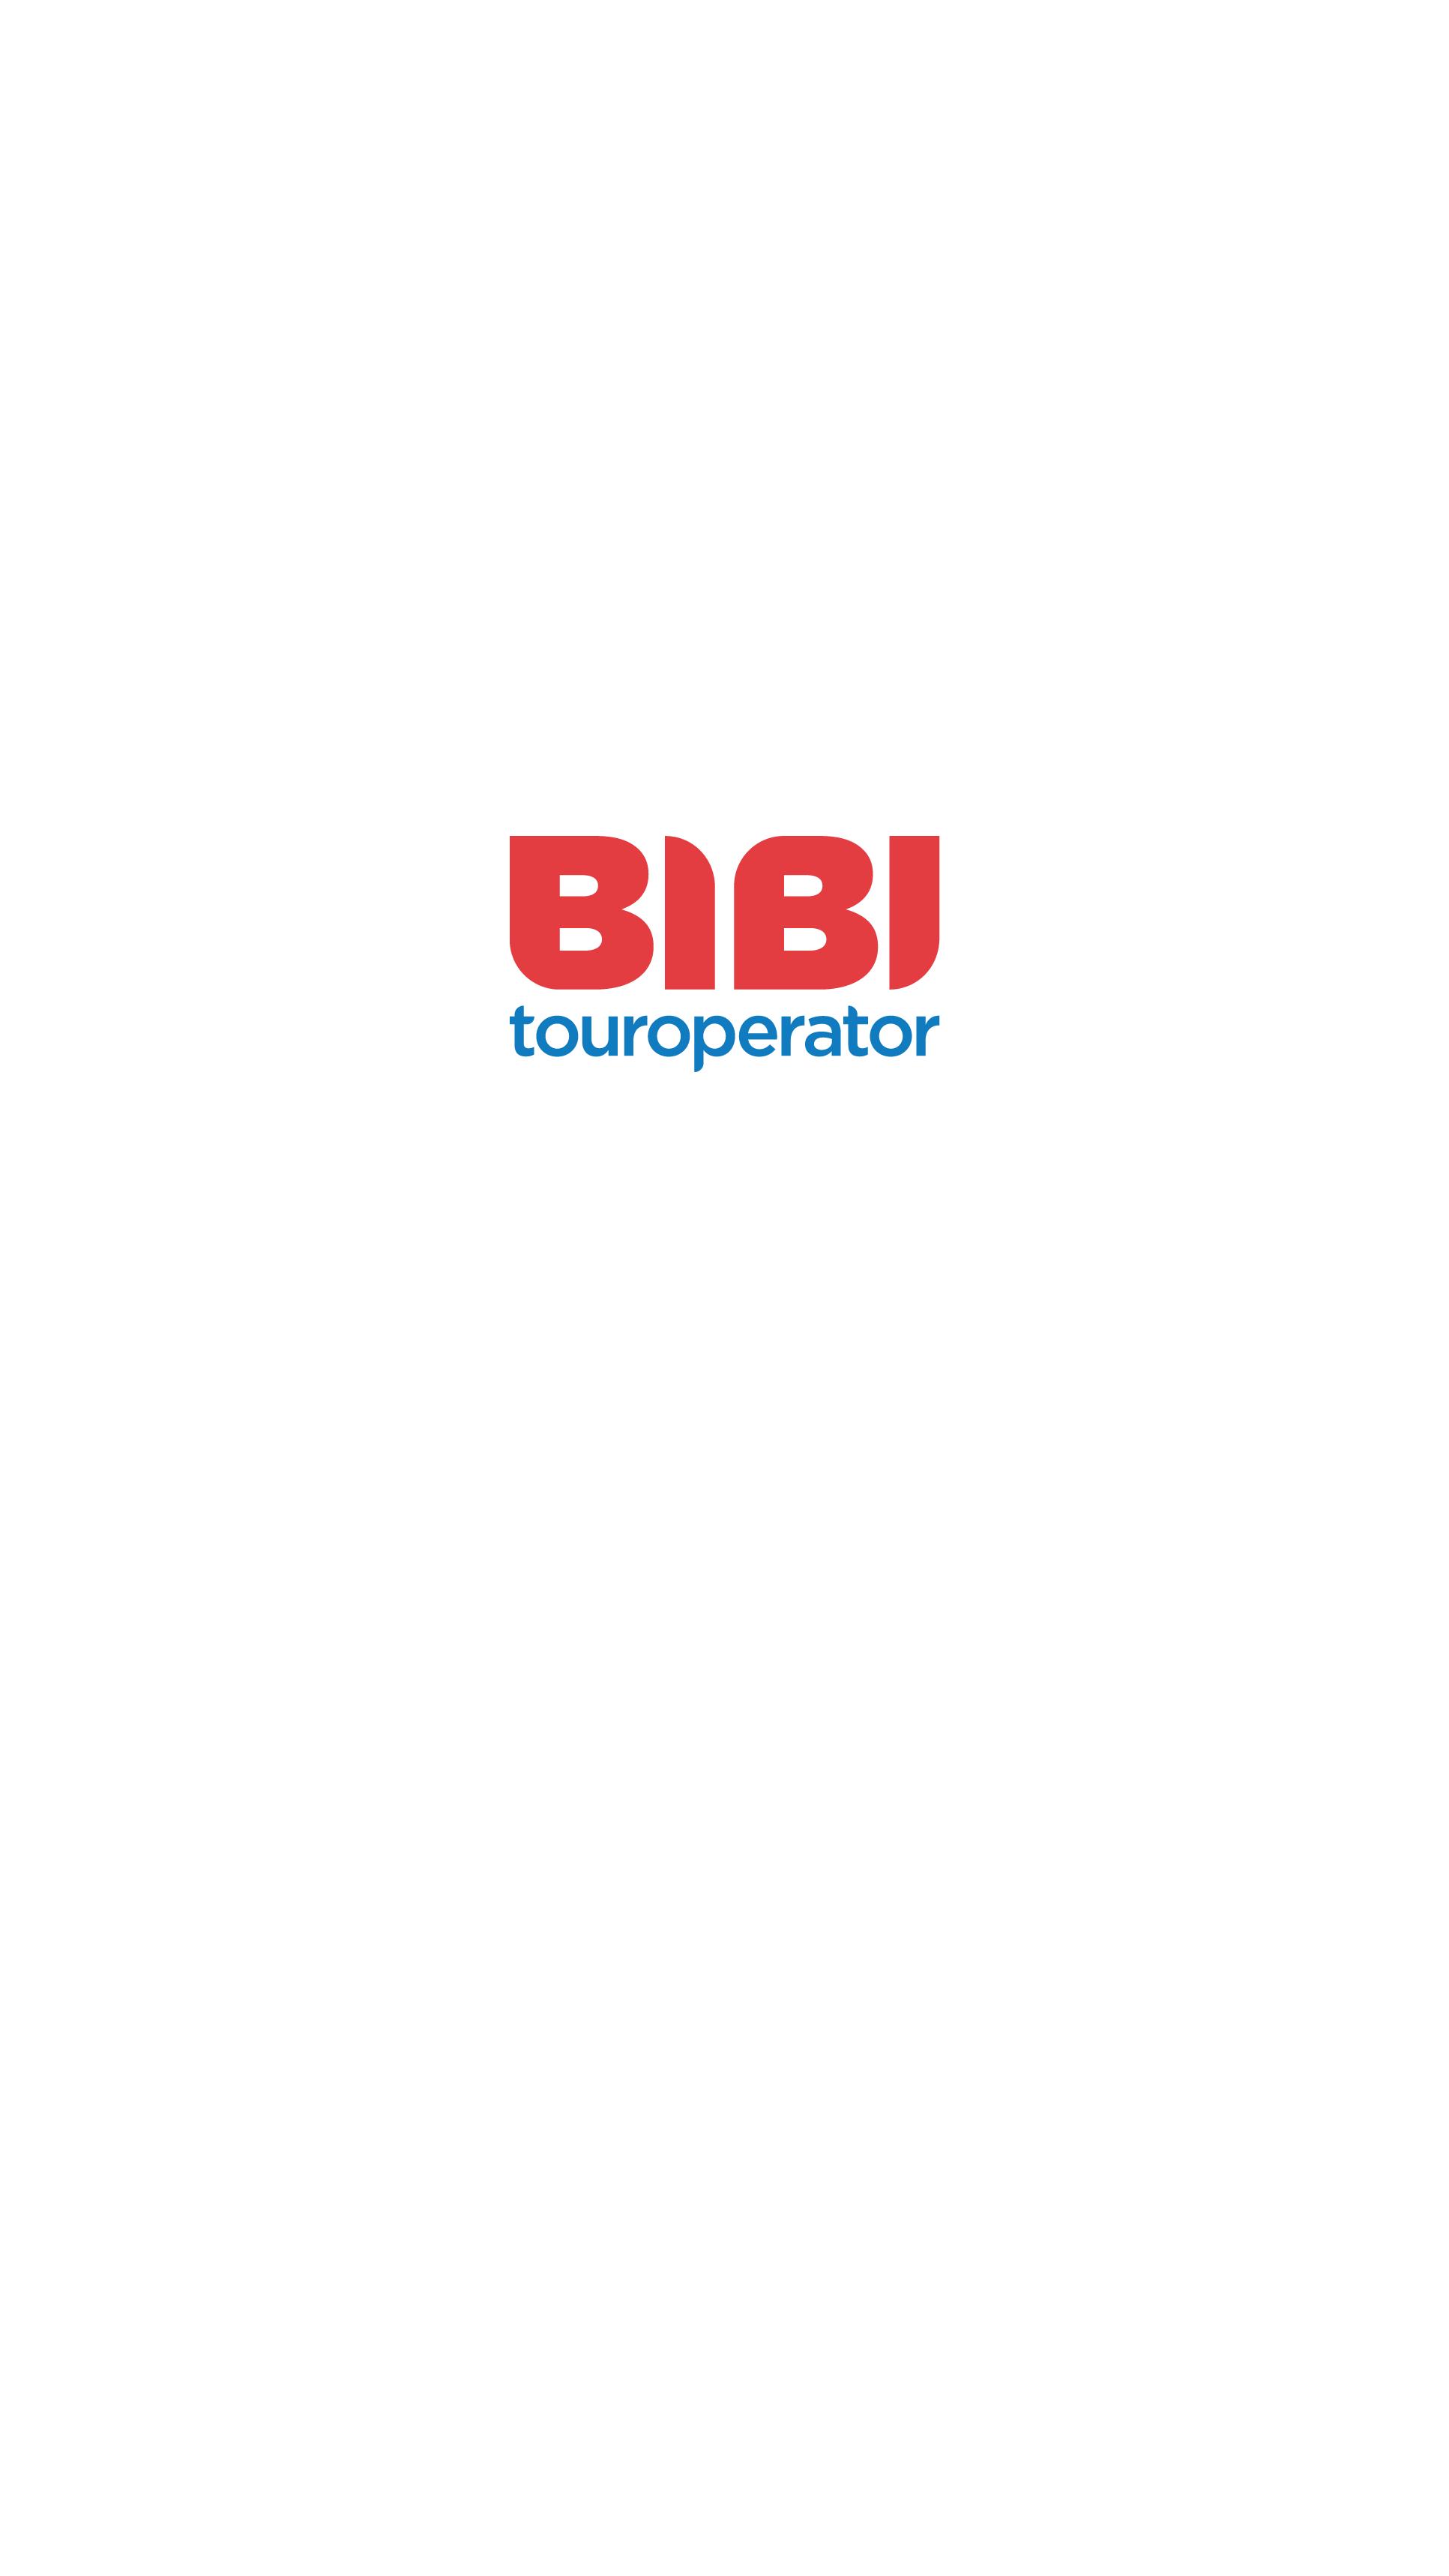 BIBI Touroperator